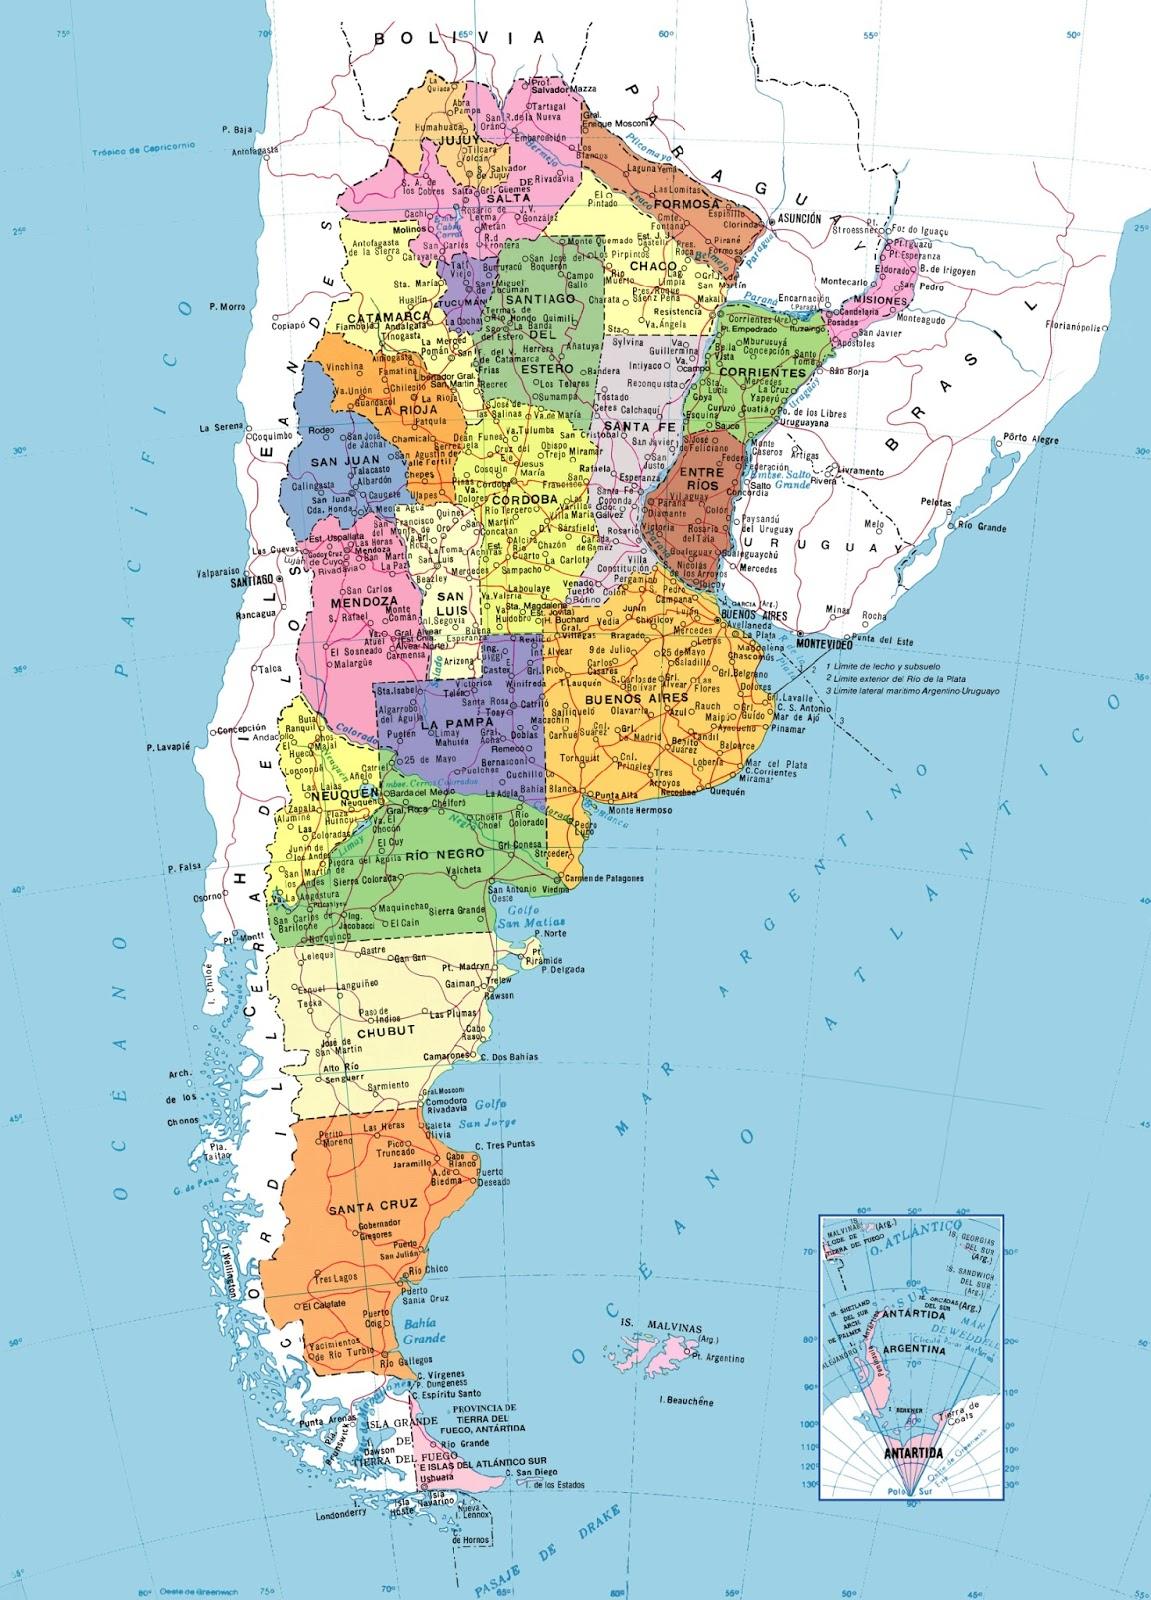 ARGENTINA POLITICO I